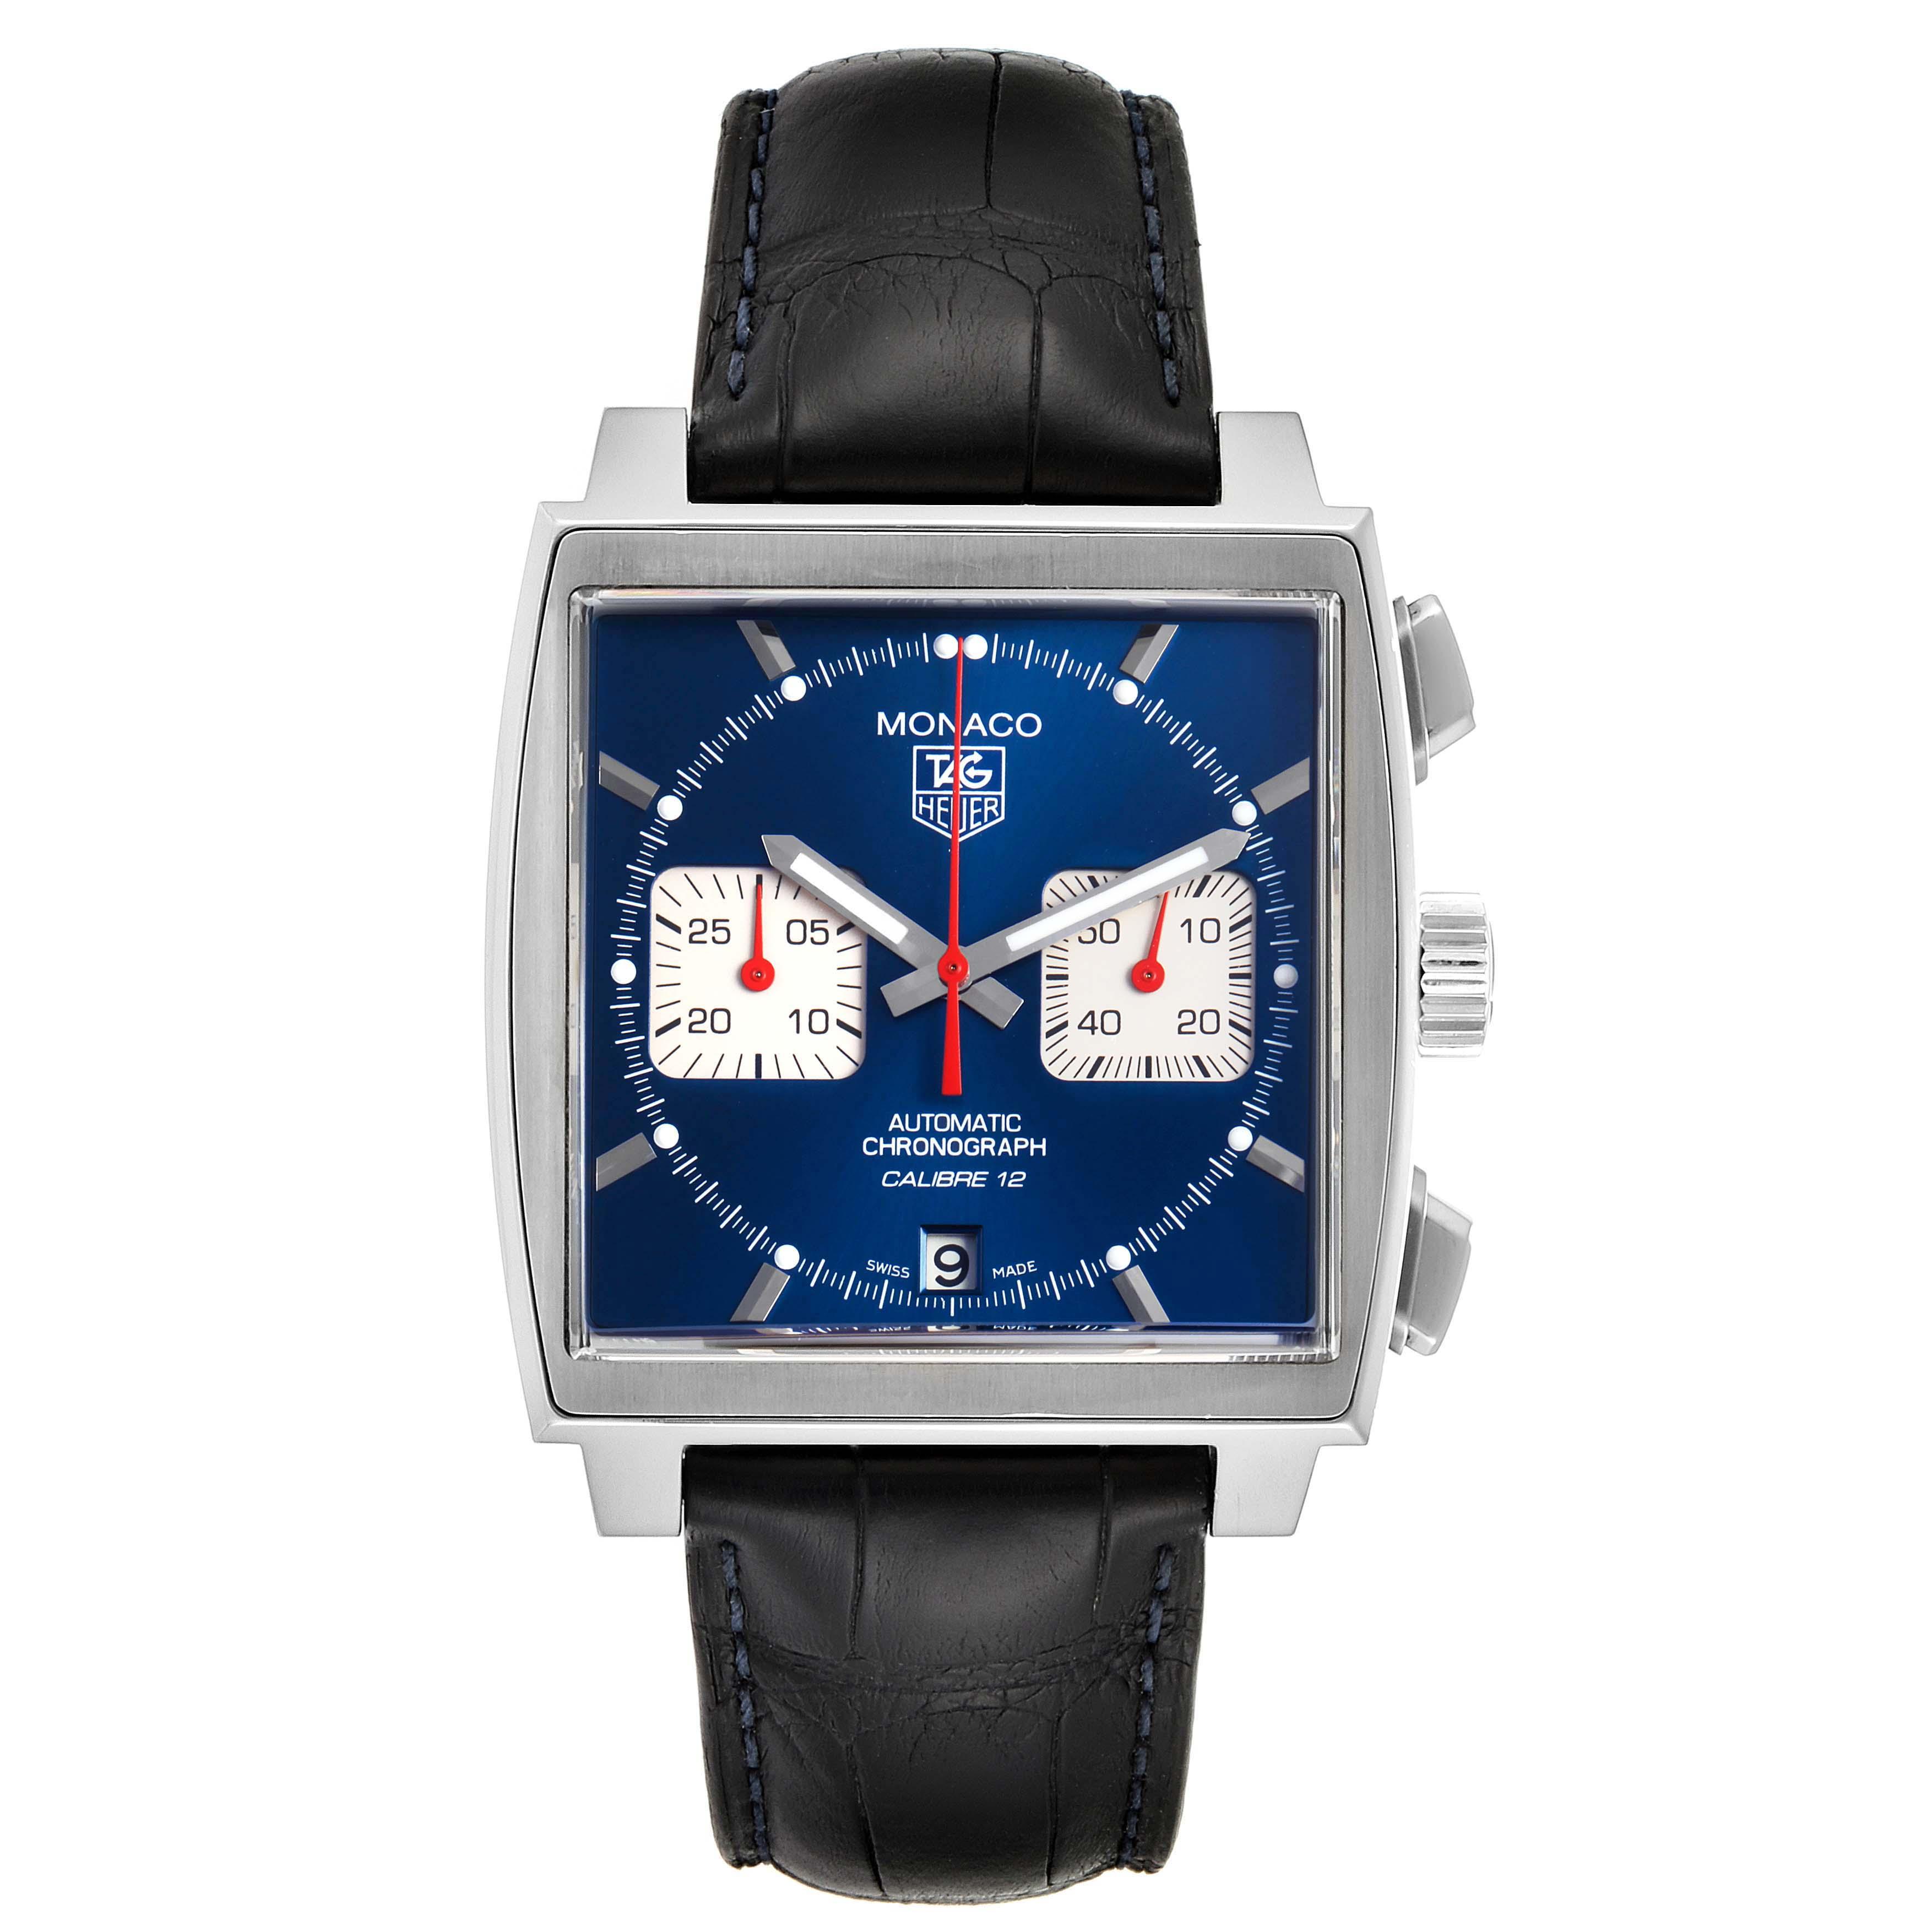 Tag Heuer Monaco Calibre 12 Blue Dial Black Strap Mens Watch CAW2111 Box Card SwissWatchExpo